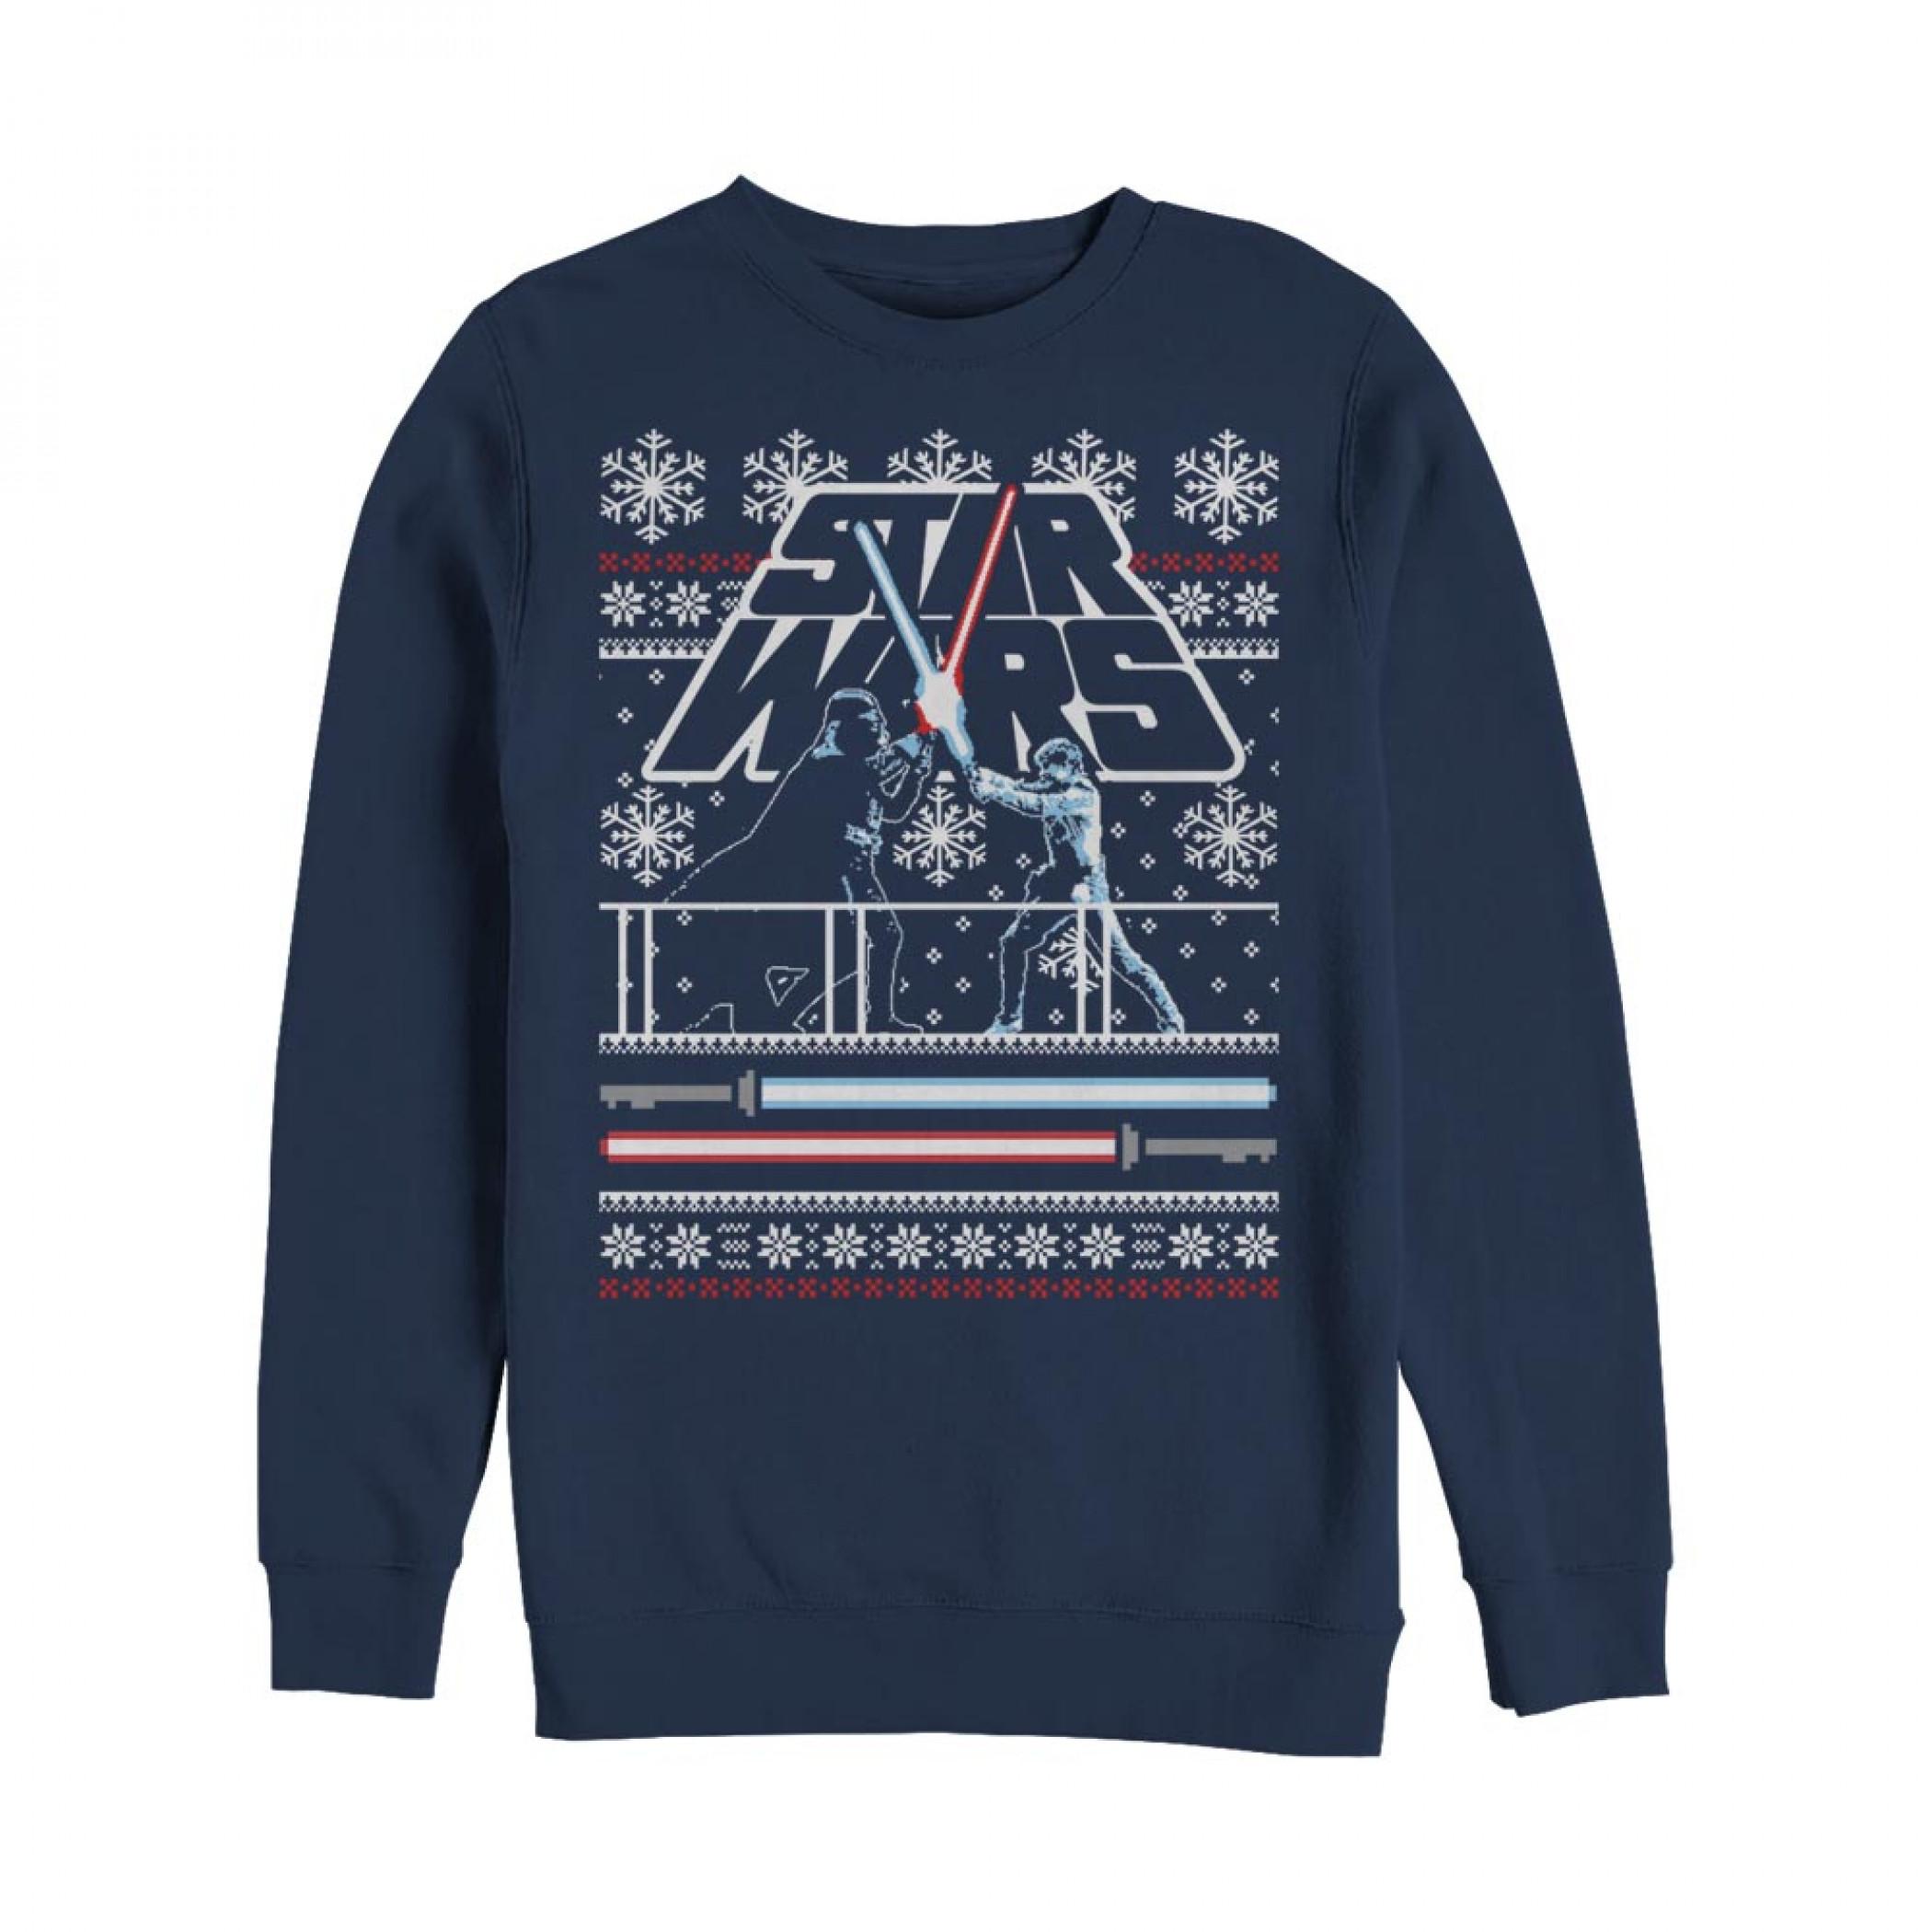 Star Wars Father and Son Memories Ugly Christmas Sweatshirt